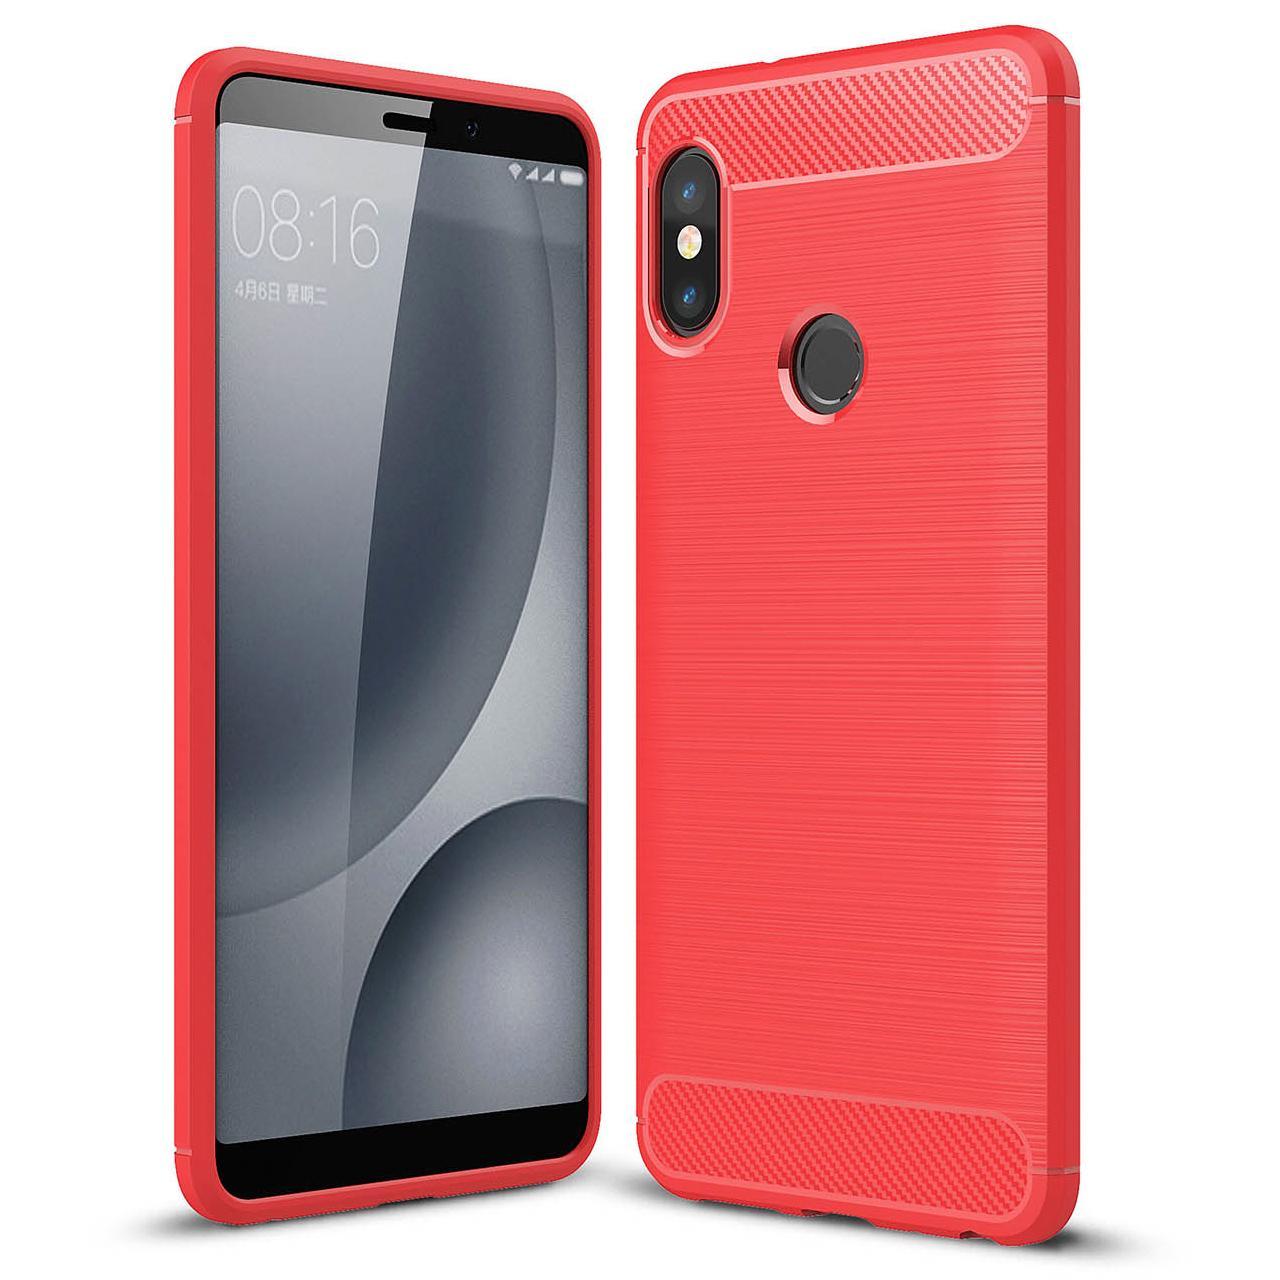 Kry 2in1 Car Phone Holder For Iphone 5s 6 6s 4s 7 Xiaomi Original Mpow Premium Mcm8 Grip Magic Air Vent Magnetic Mount Rymall Redmi Note 5 Pro Case Soft Tpu Silicone Carbon Fiber Brushed Design Bumper